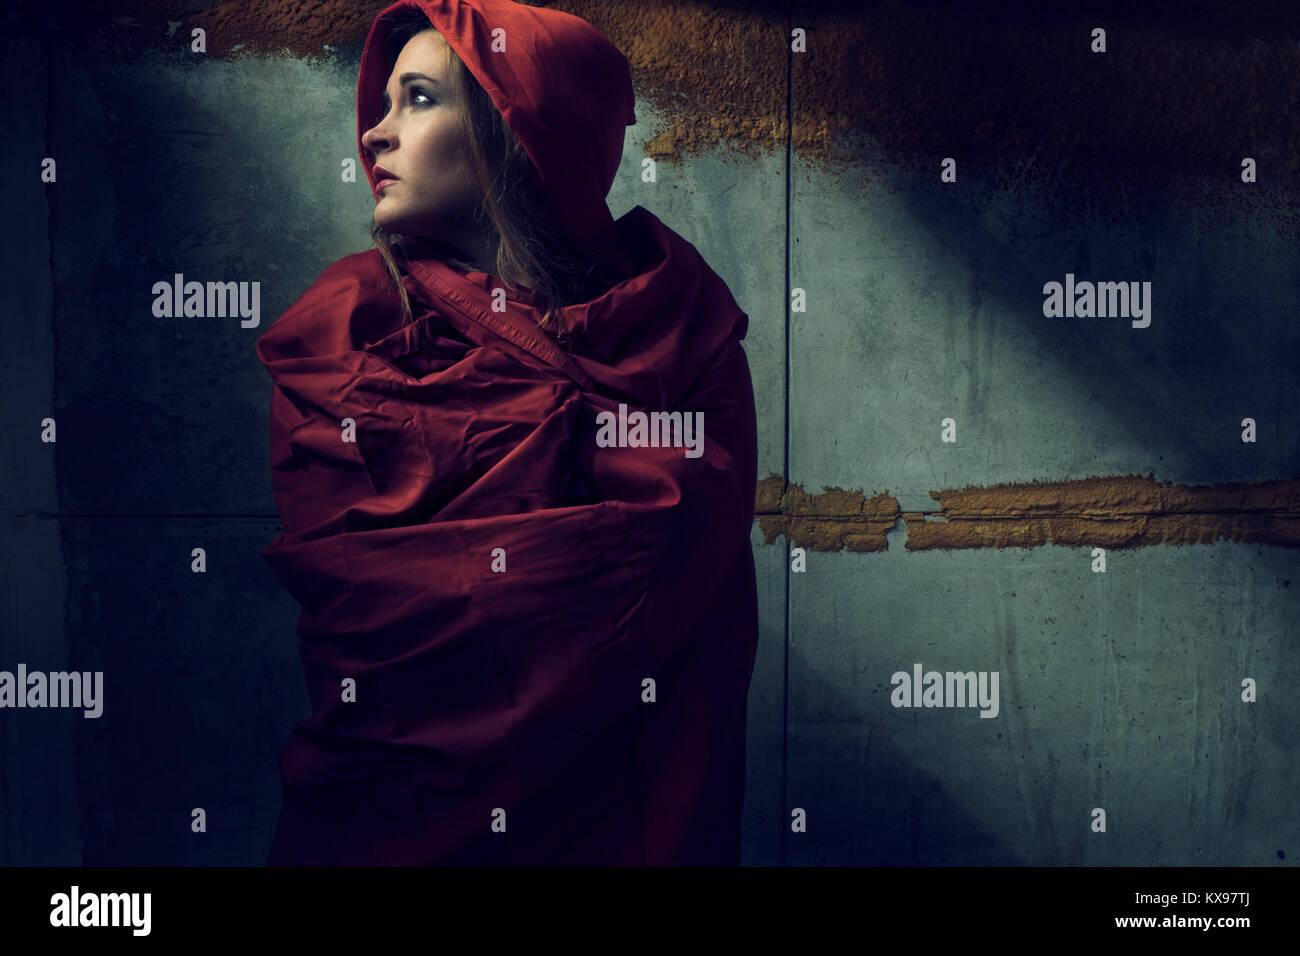 Junge Frau in rotem Umhang und Kapuze gewickelt Stockbild